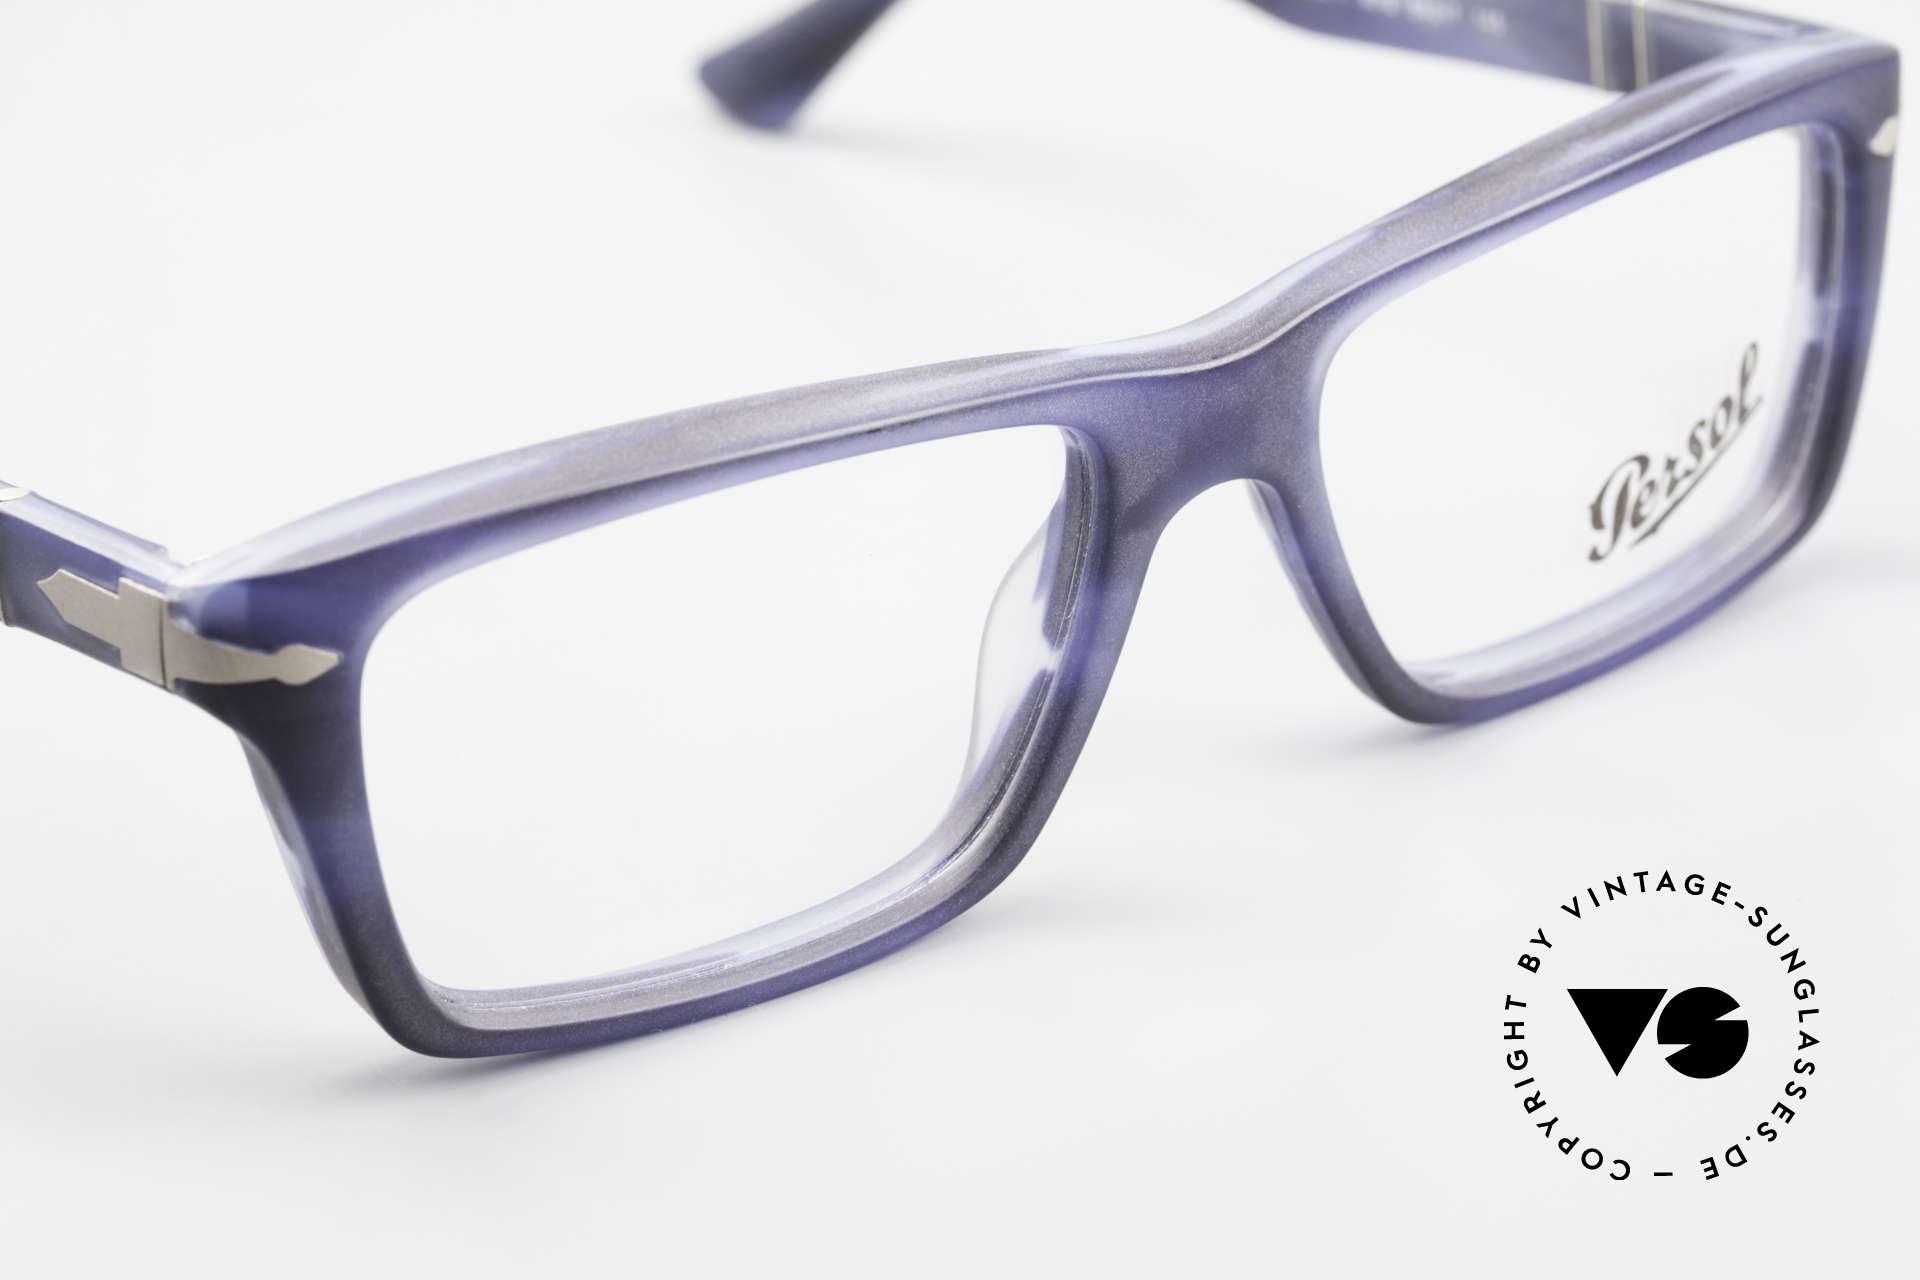 Persol 3060 Striking Eyeglasses For Men, reissue of the old vintage Persol RATTI models, Made for Men